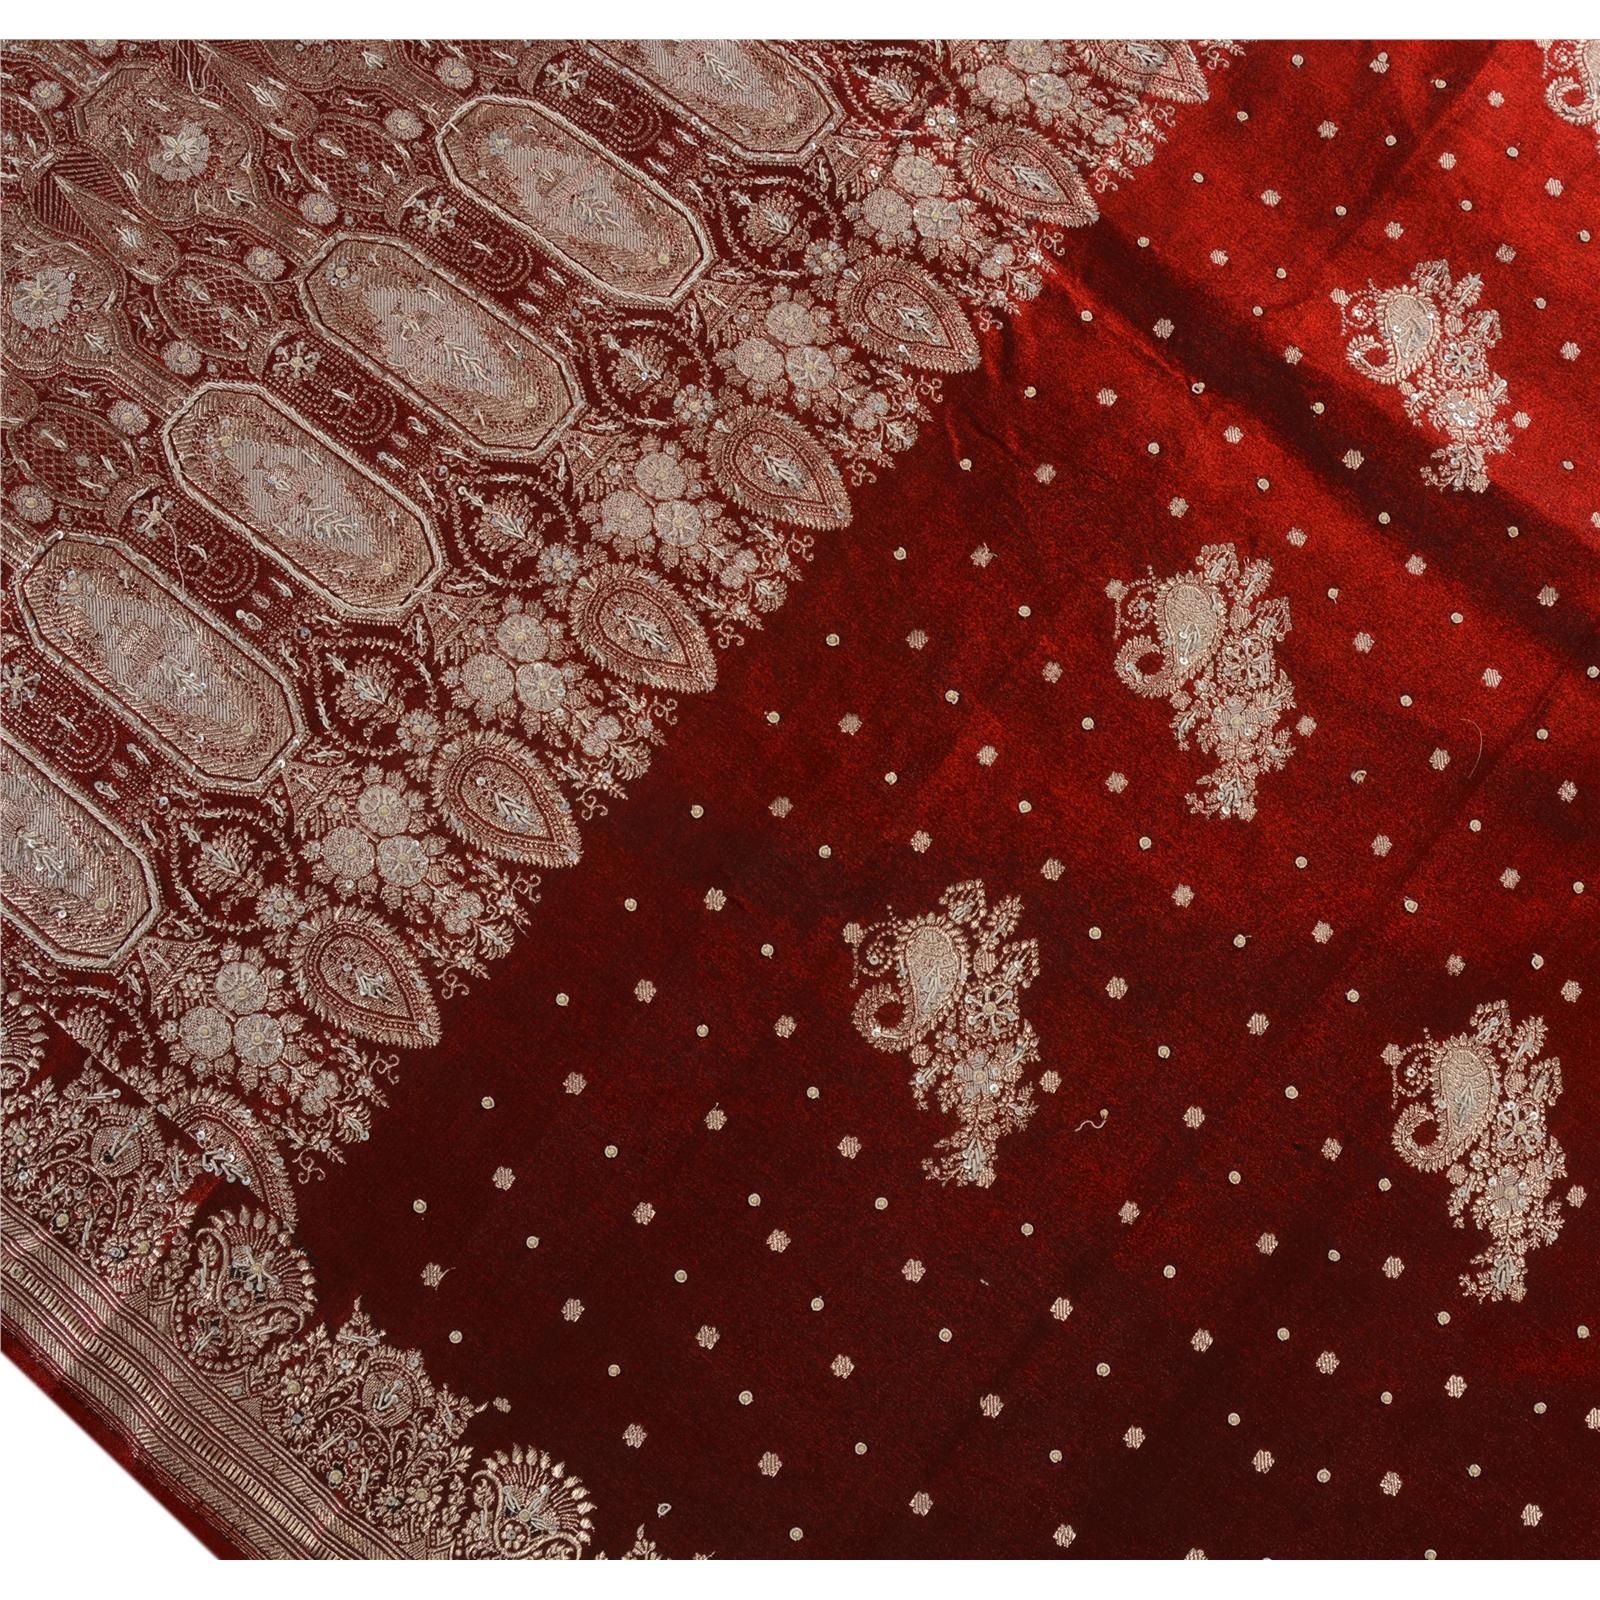 Vintage saree art silk hand embroidery woven brocaded